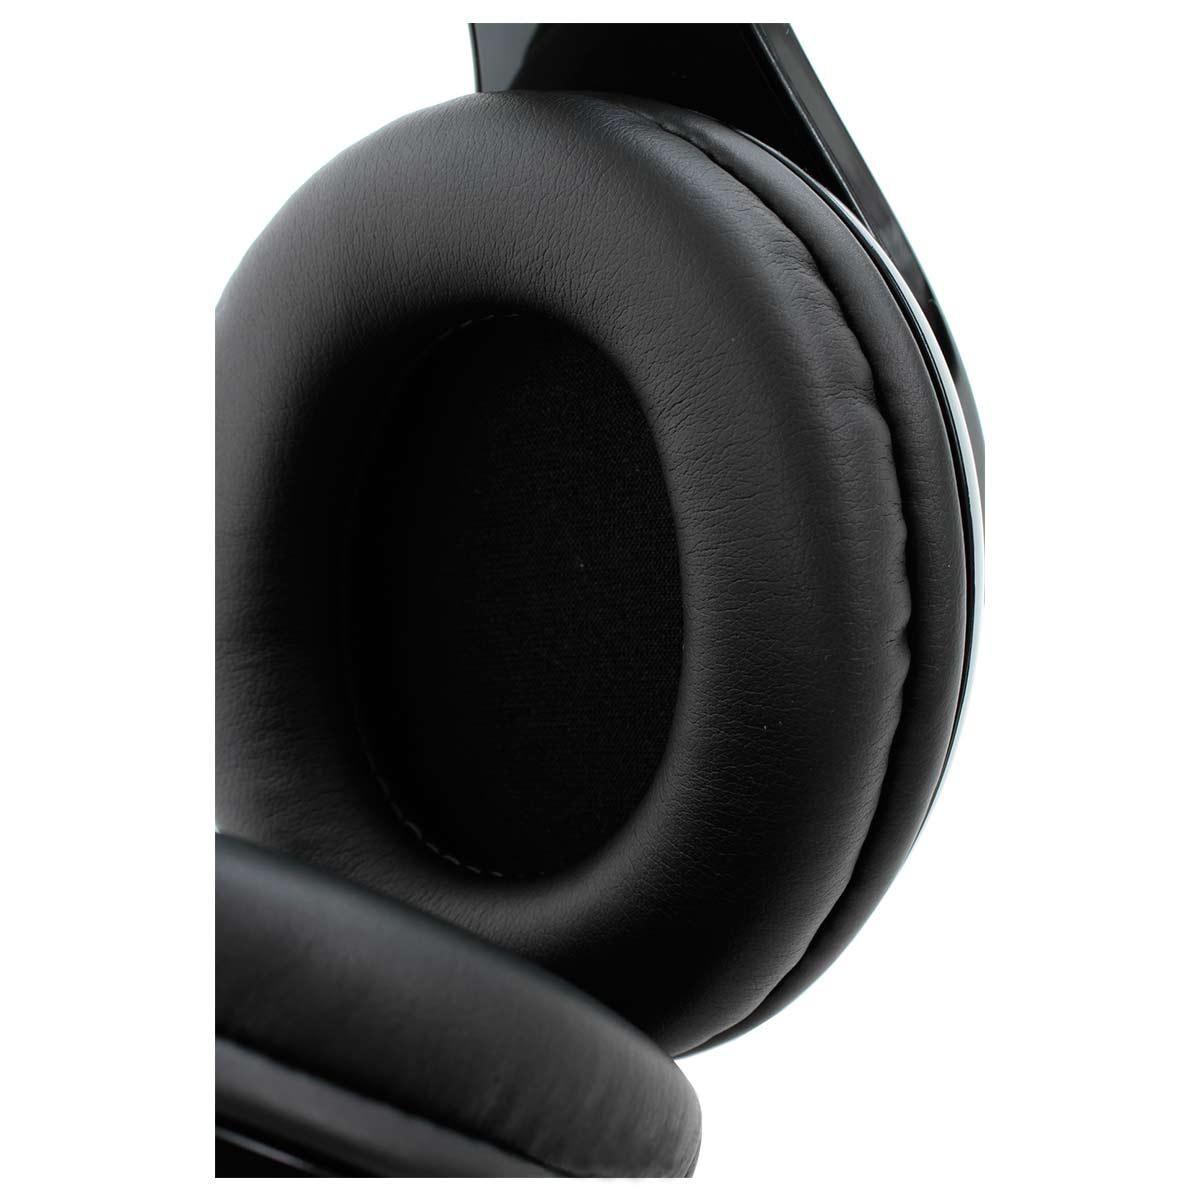 Fone de Ouvido Over-ear 20 Hz - 20 KHz 38 Ohms - SRH 240 A Shure